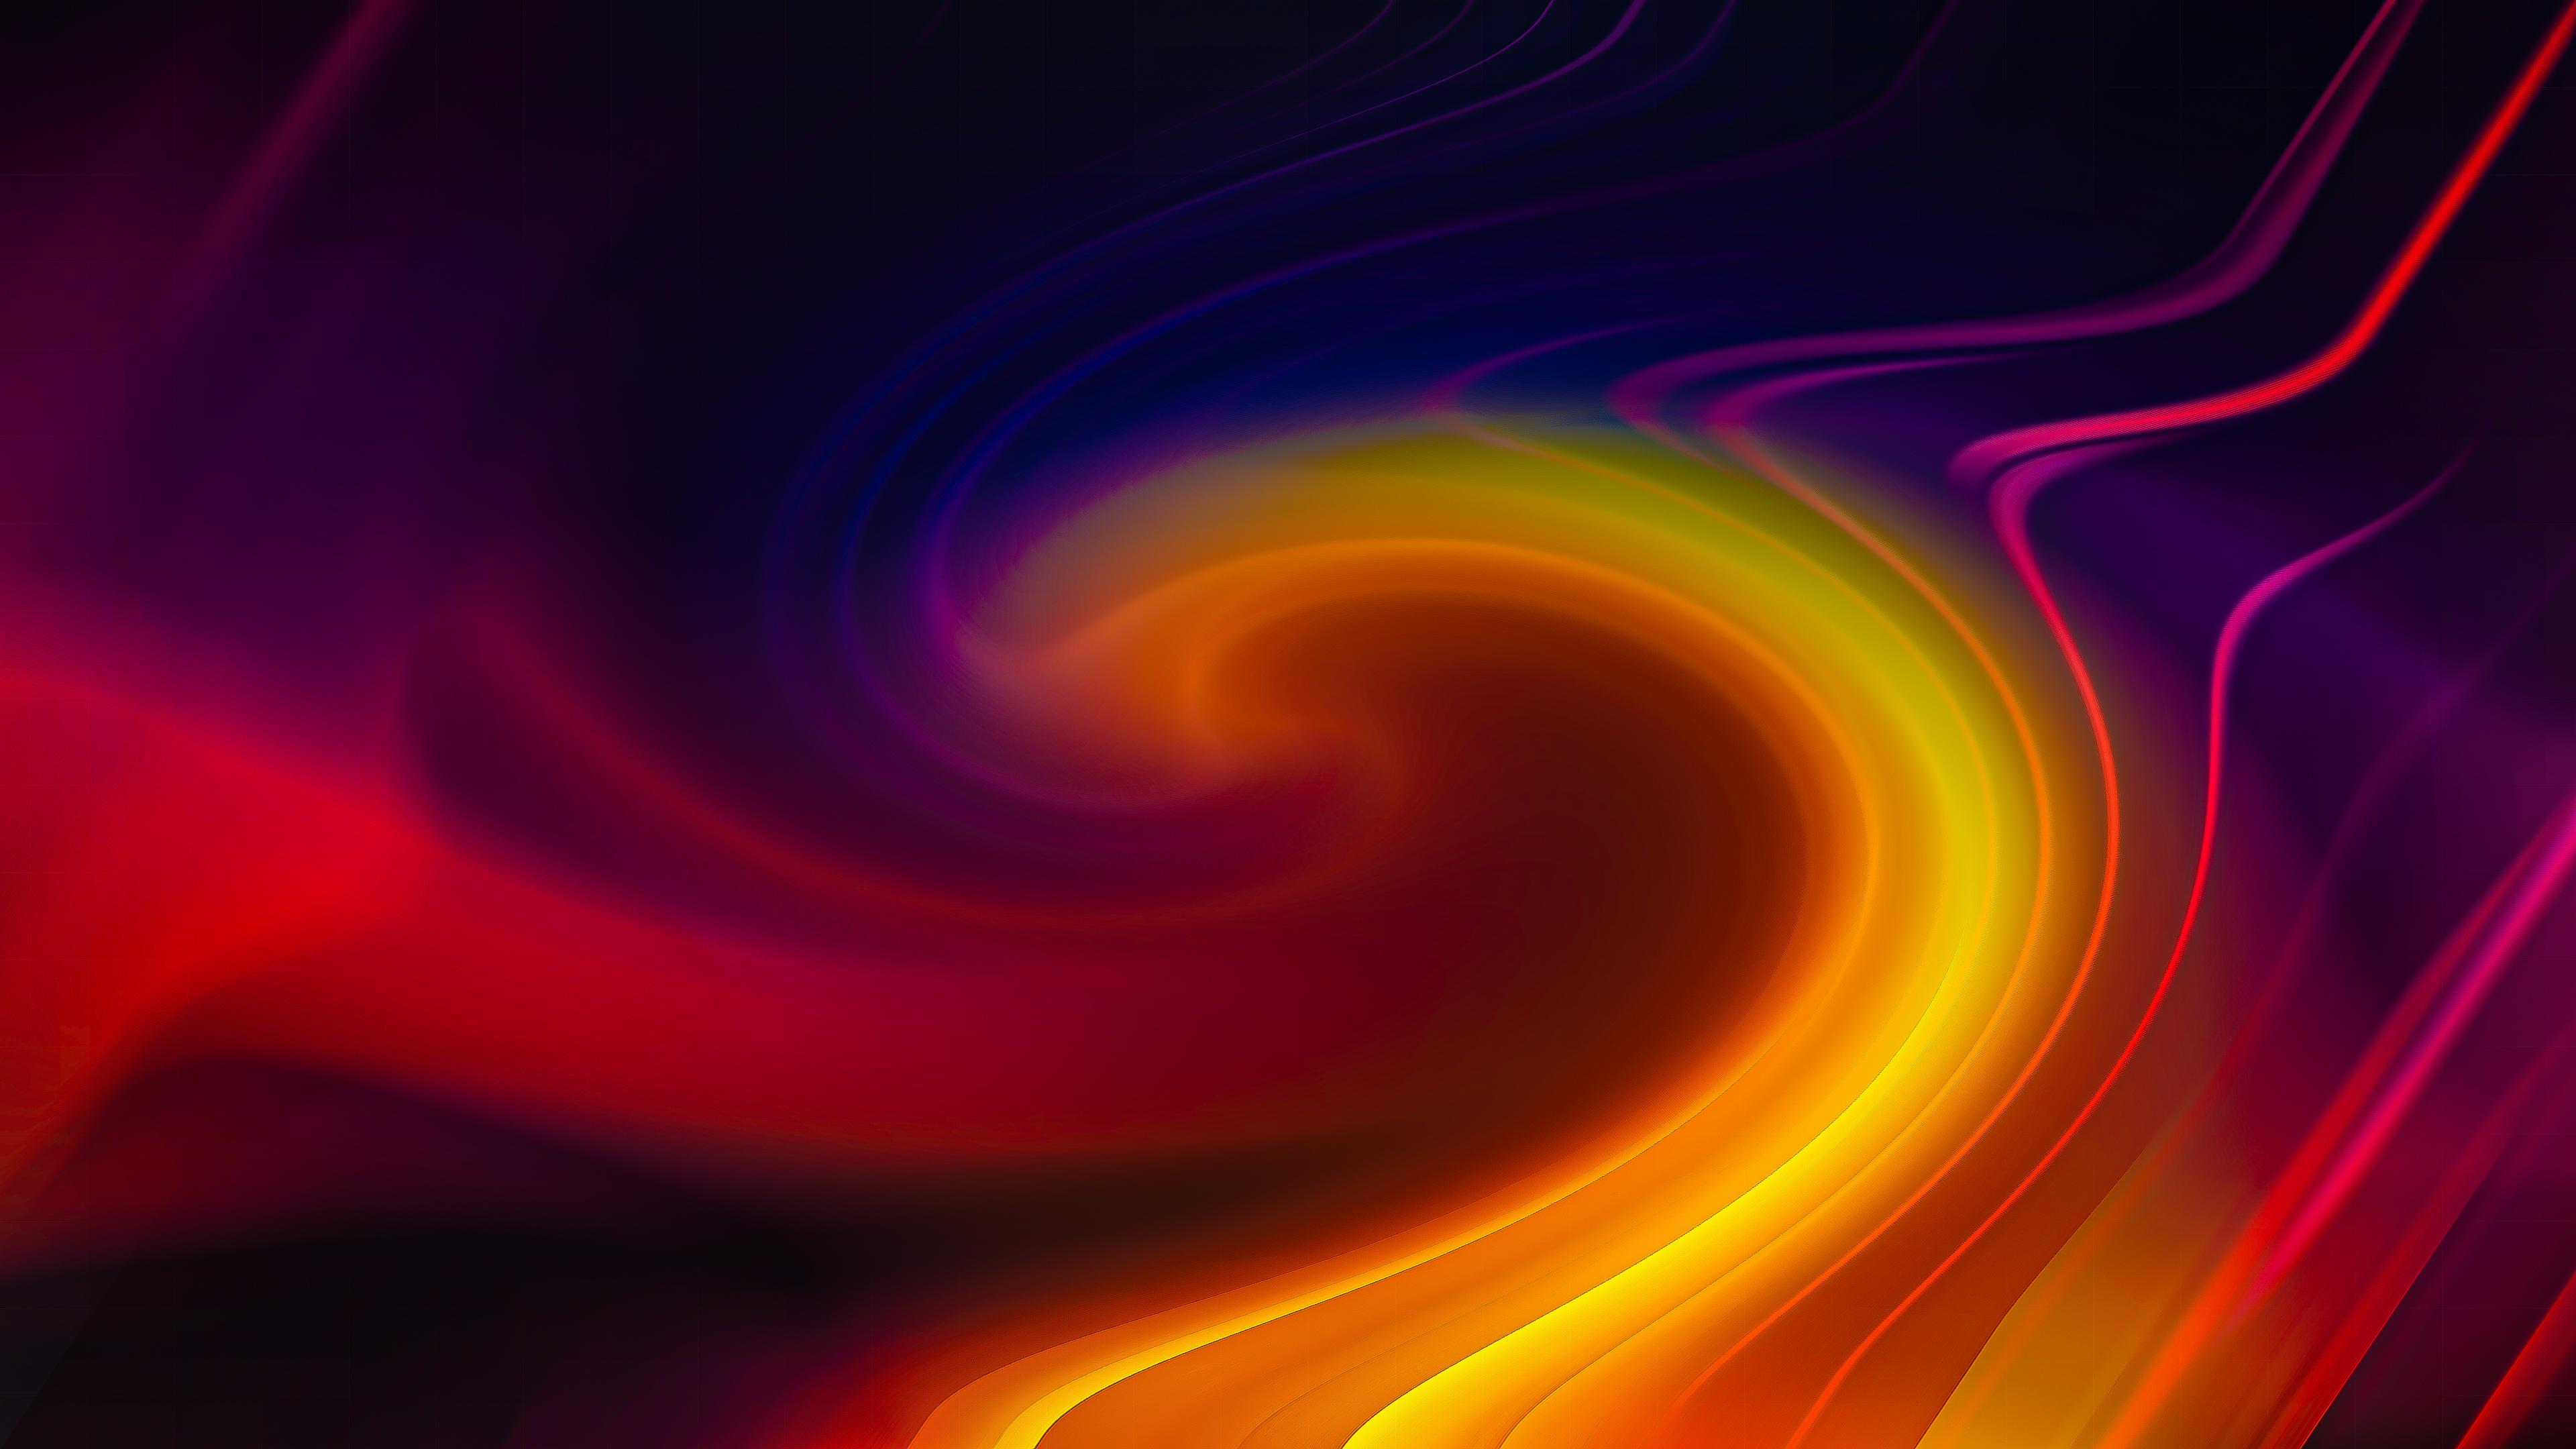 abstract lap 1575661466 - Abstract Lap -